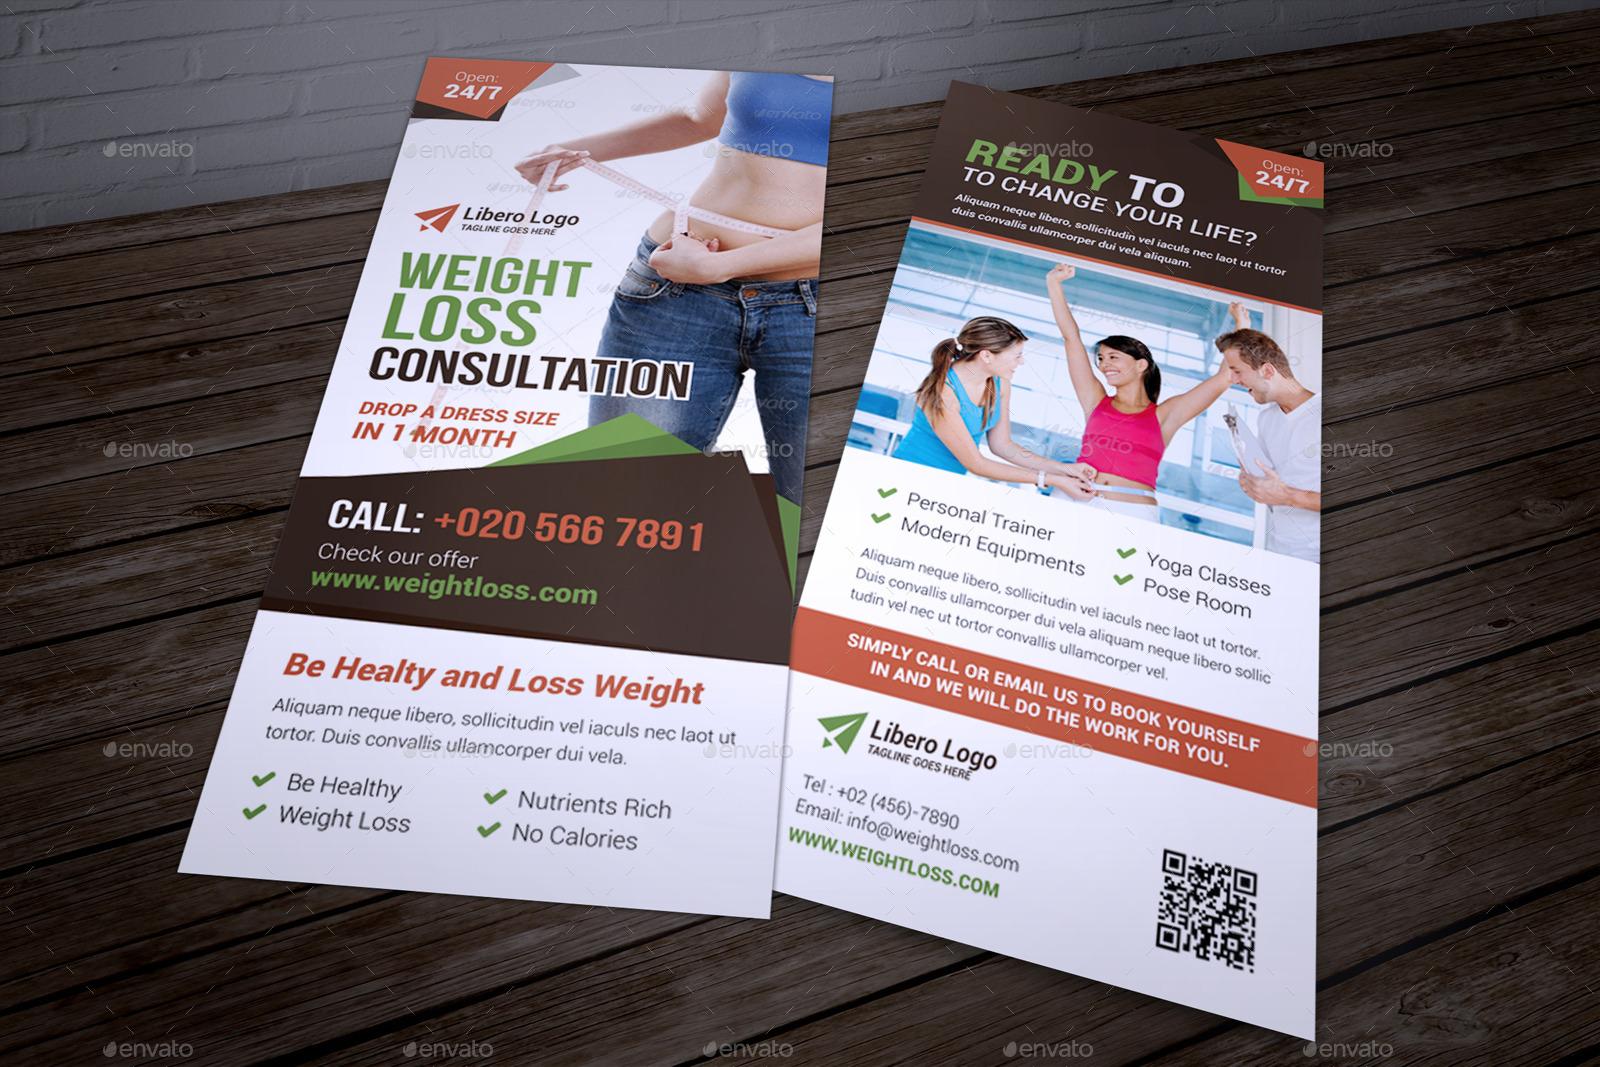 Pharmacy Flyer DL Size Template On Behance Oukasinfo - Dl size flyer template